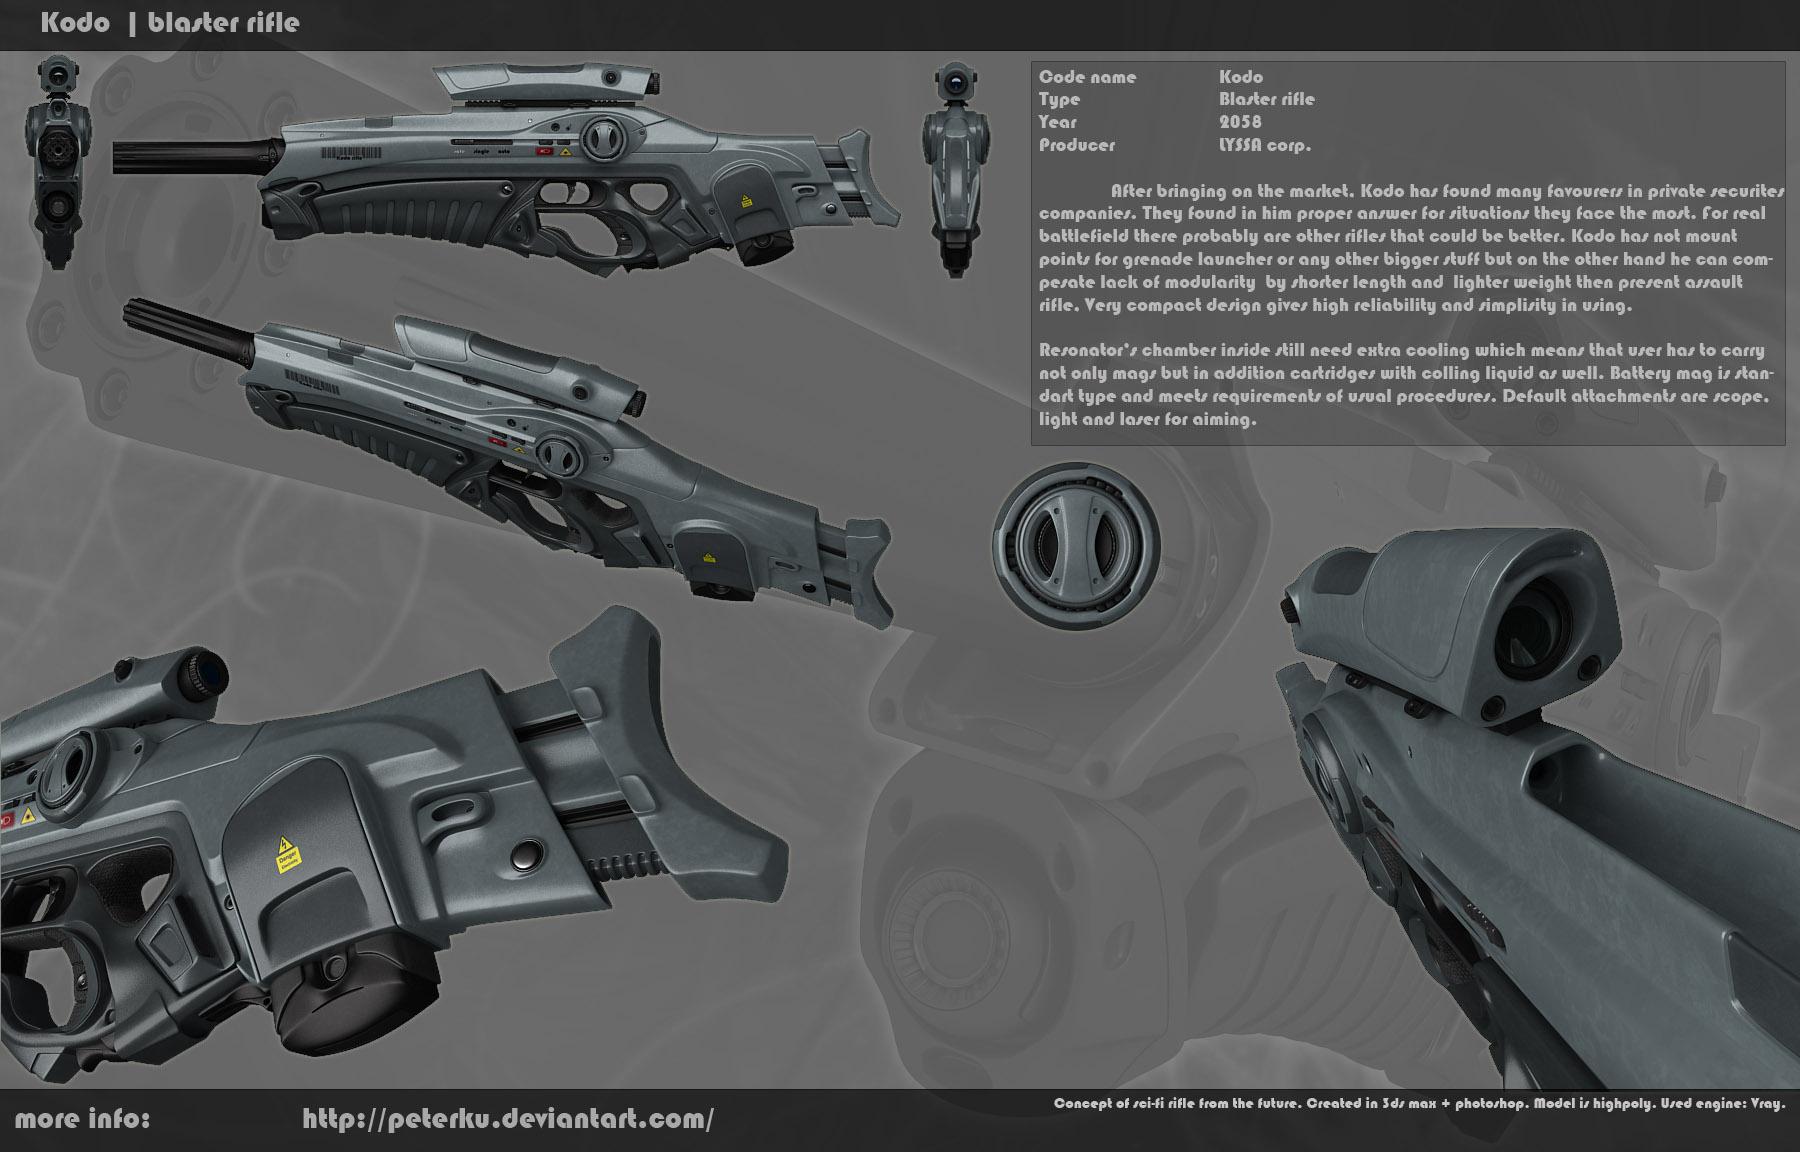 Kodo rifle - tech drawing by peterku